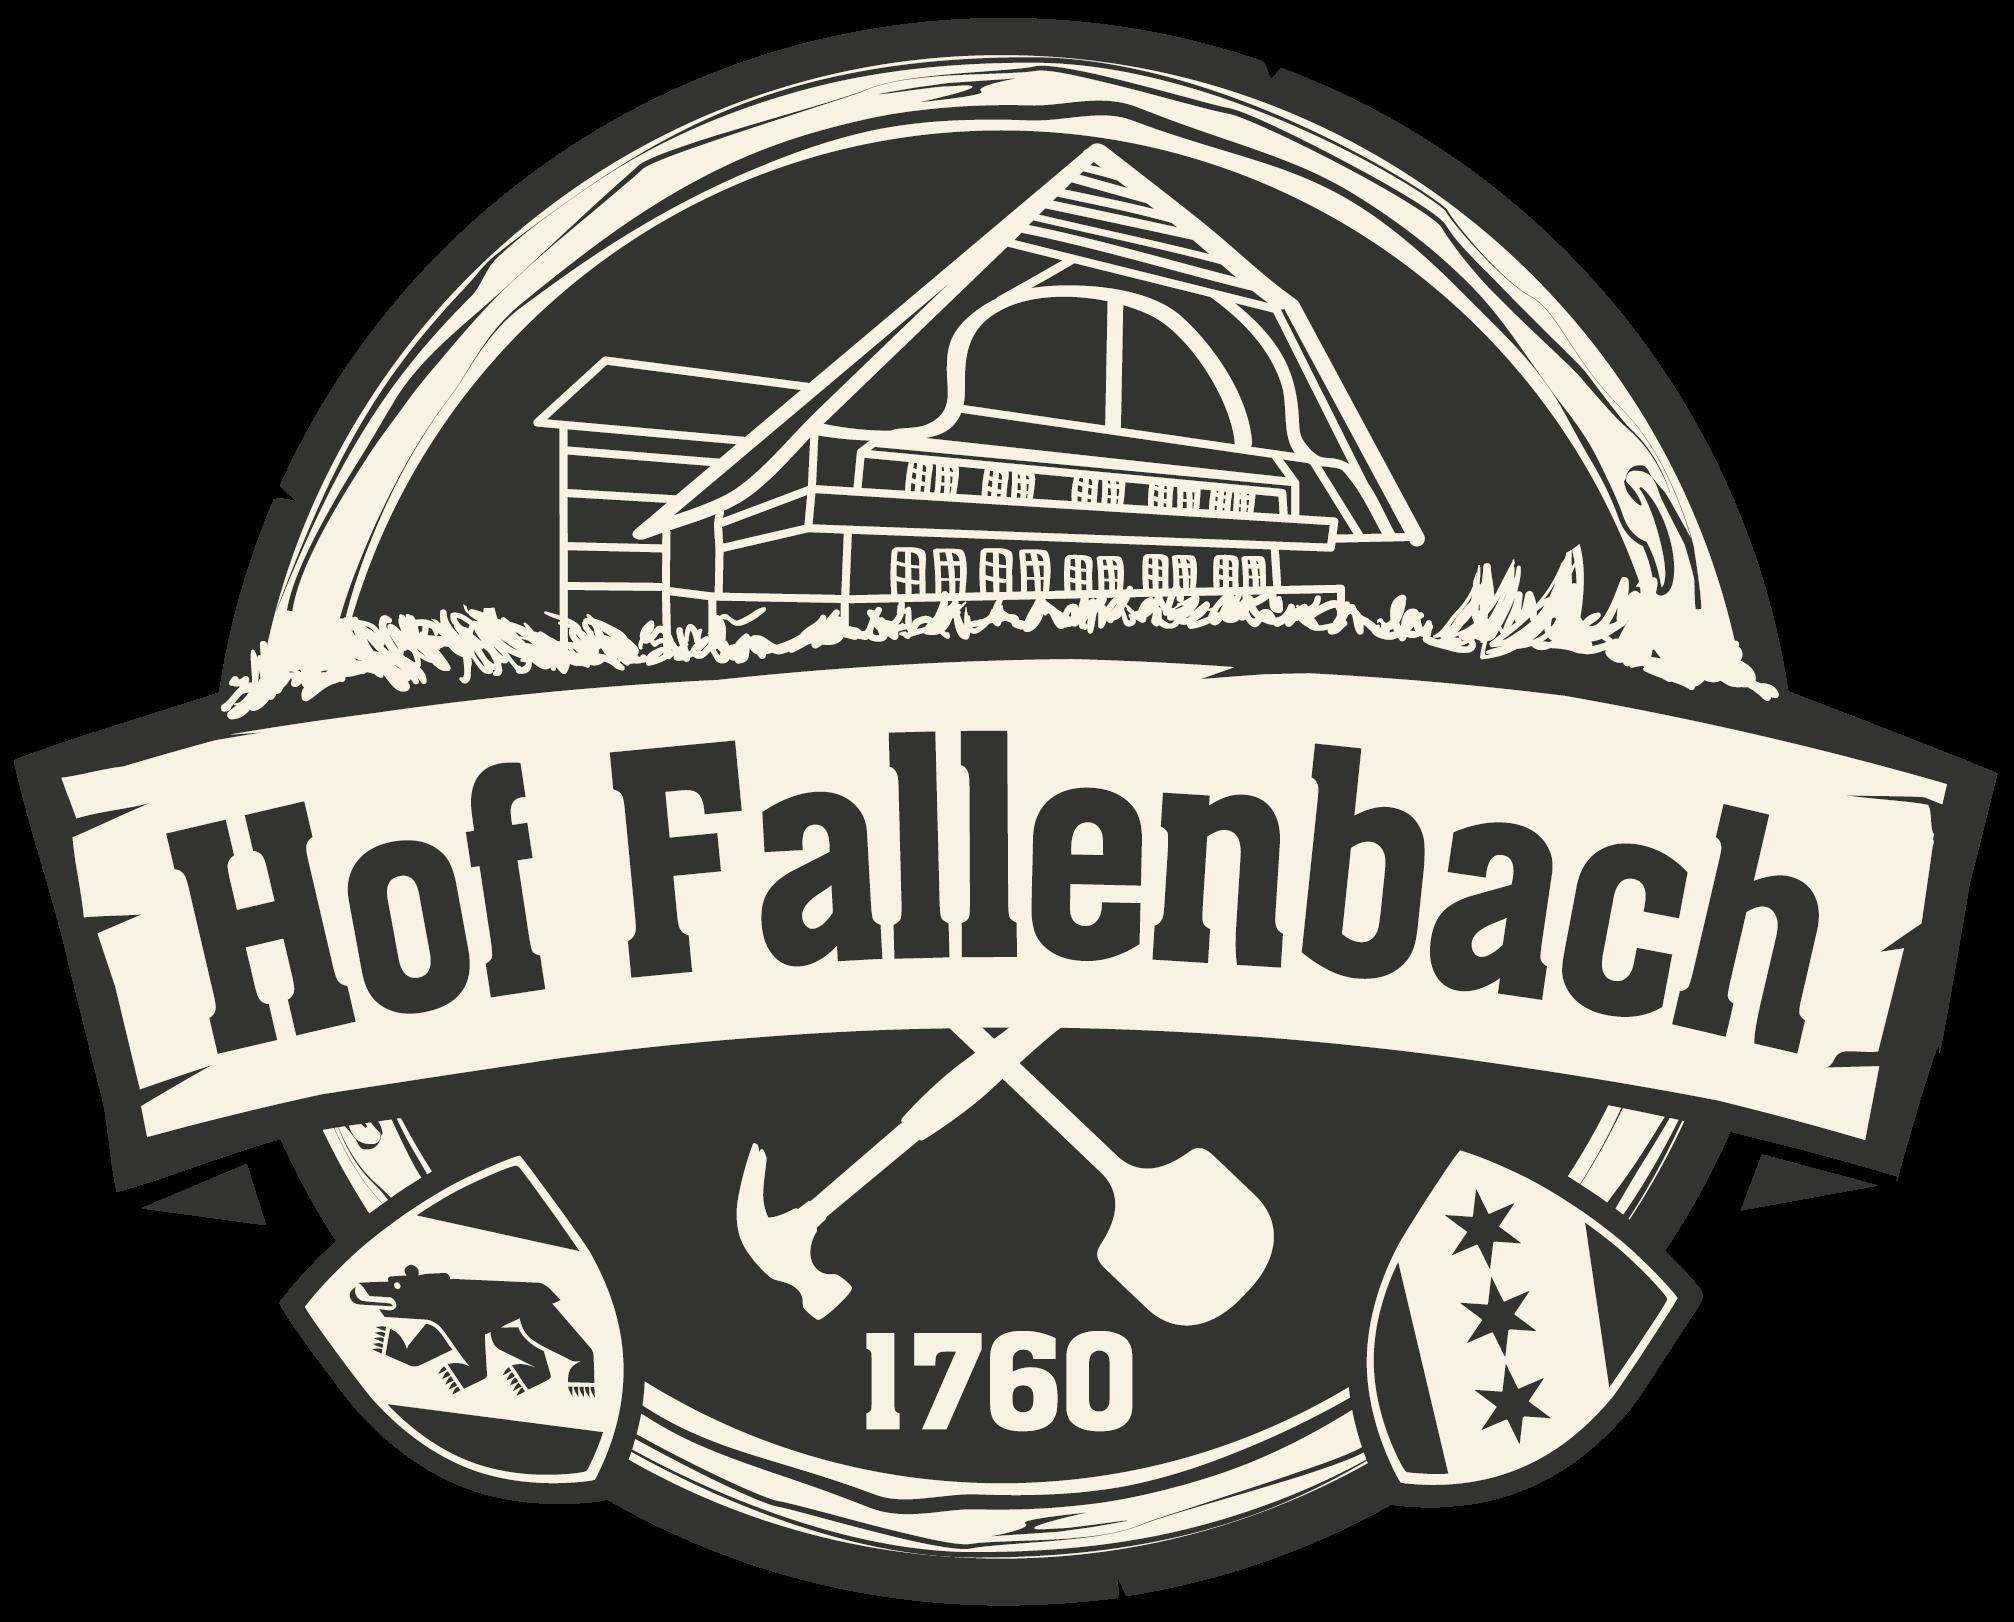 Hof Fallenbach